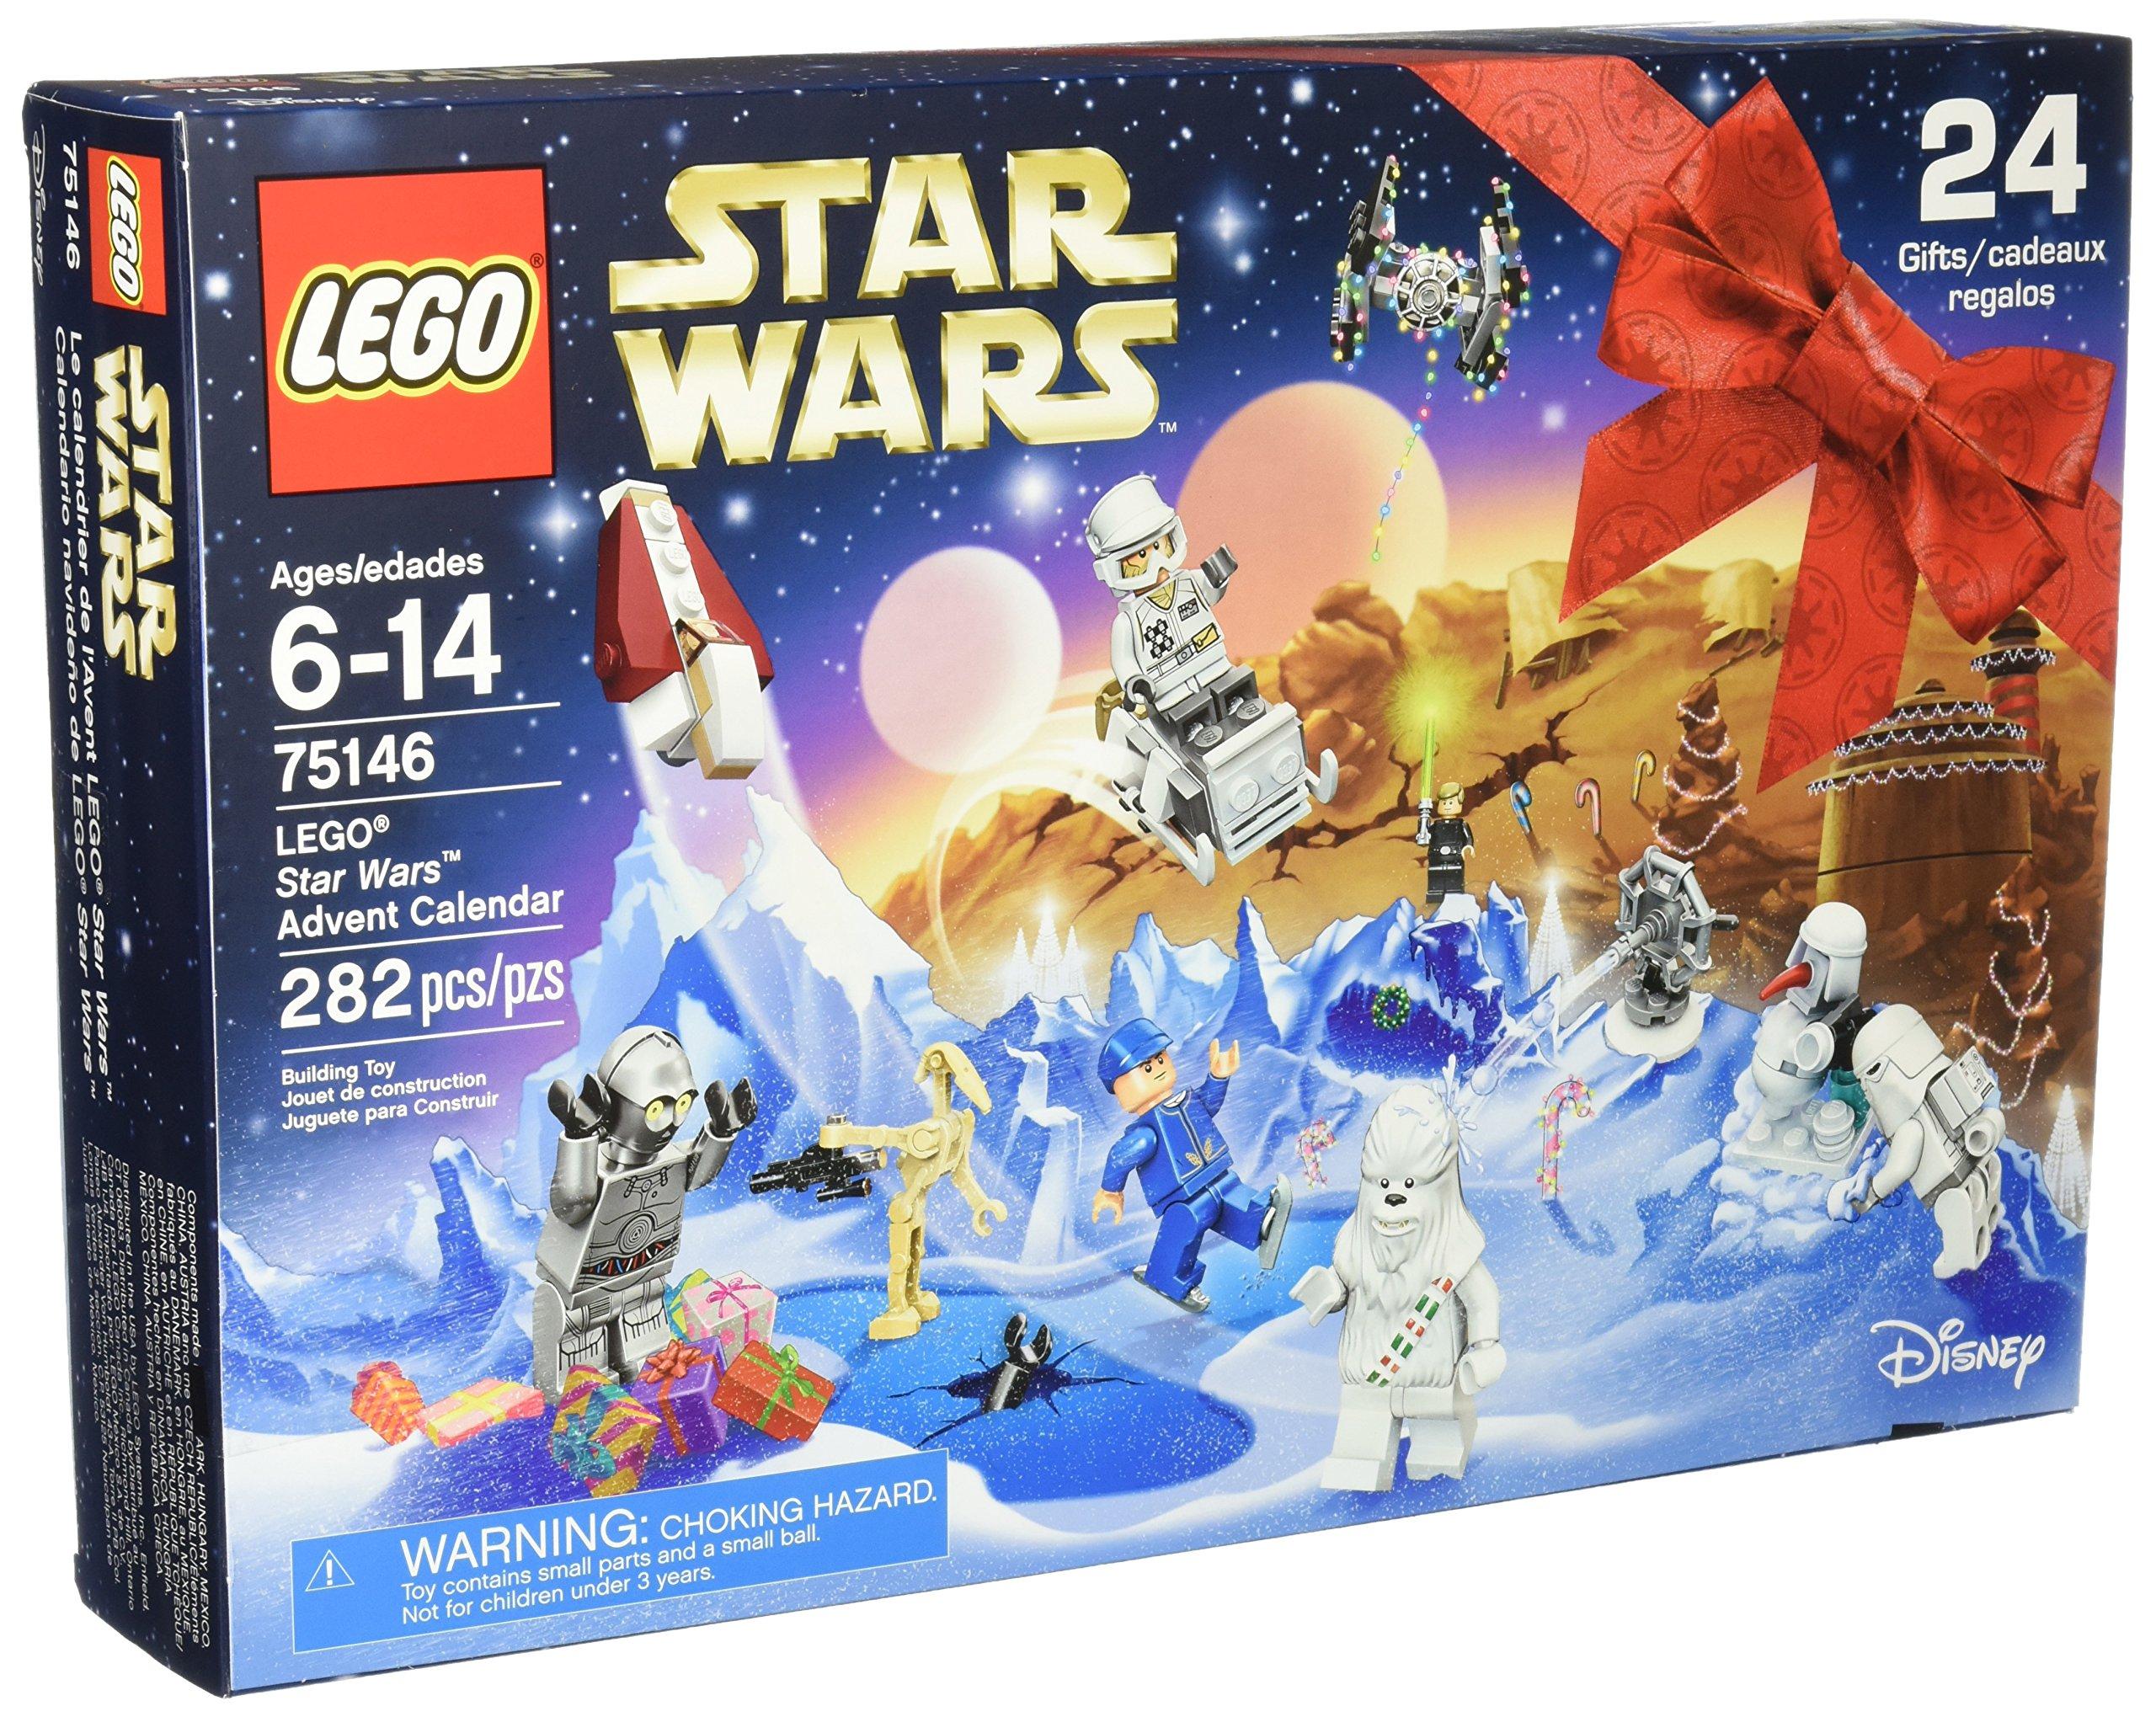 466d5b6e3 LEGO Star Wars 75146 Advent Calendar Building Kit (282-Piece) product image